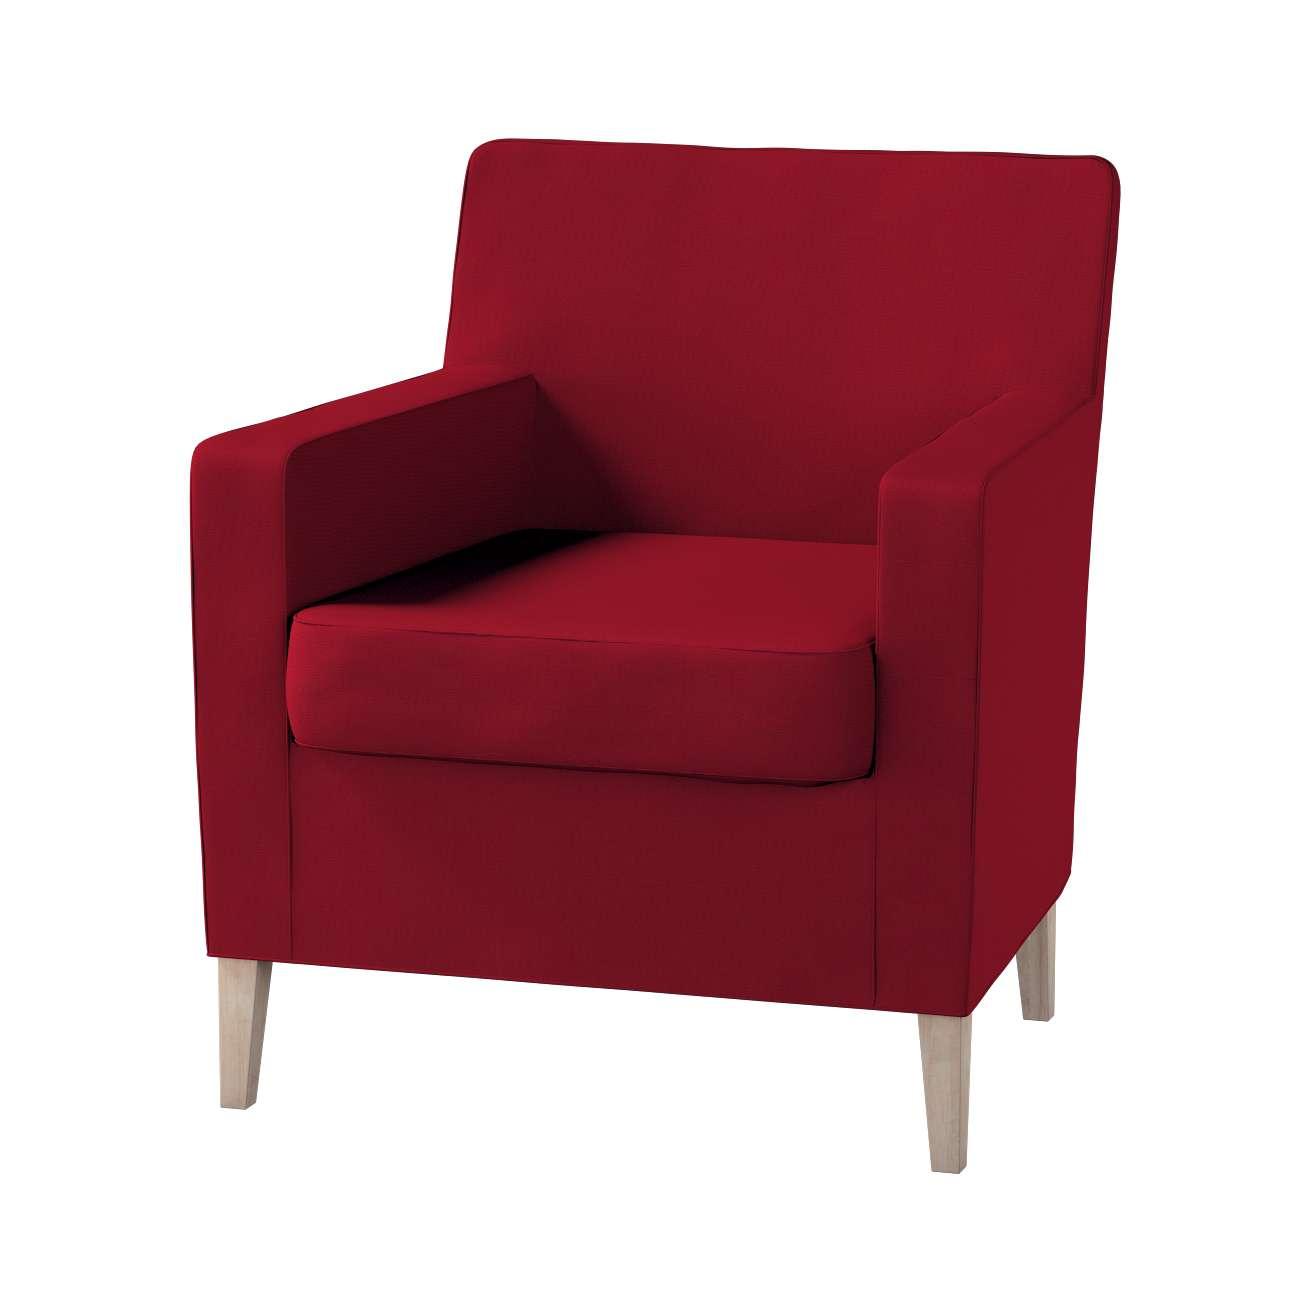 Pokrowiec na fotel Karlstad Fotel  Karlstad w kolekcji Etna , tkanina: 705-60